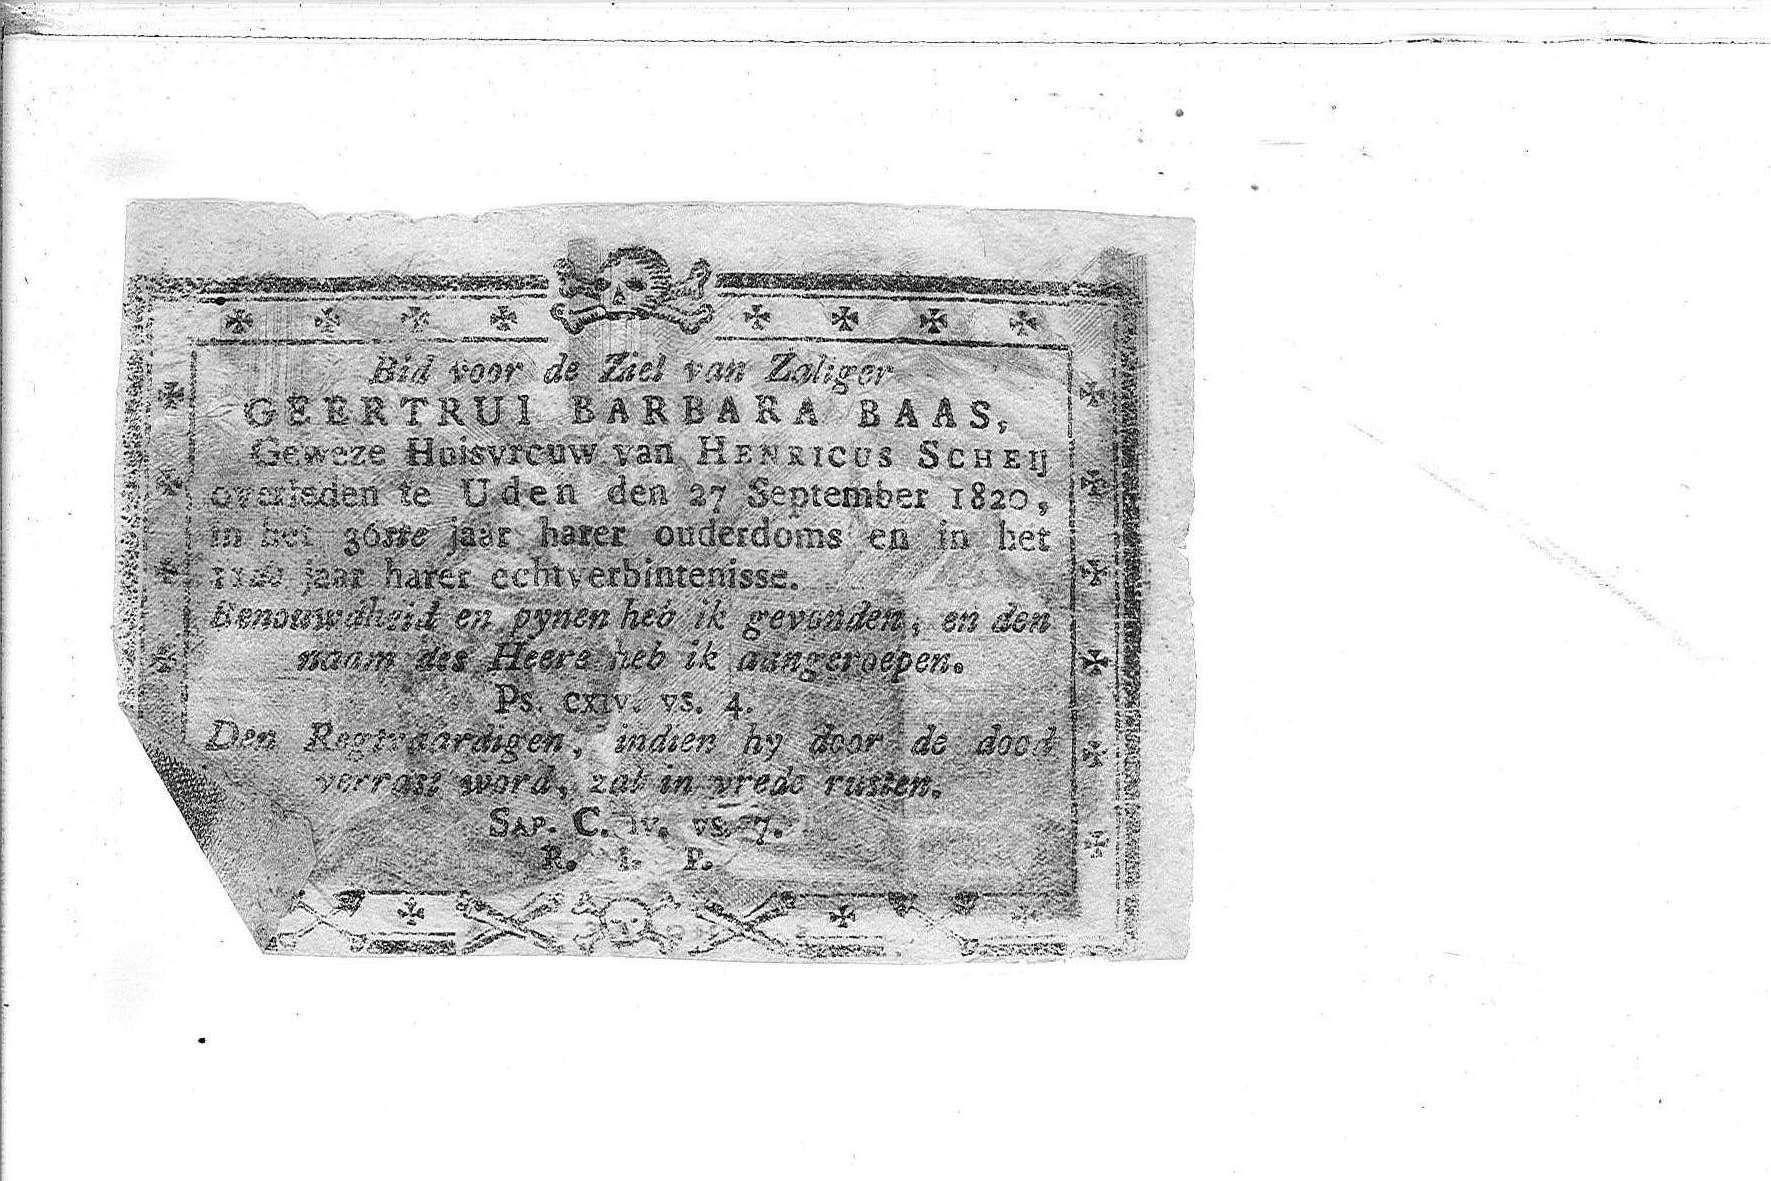 Geertrui-Barbara(1820)20100924163132_00013.jpg